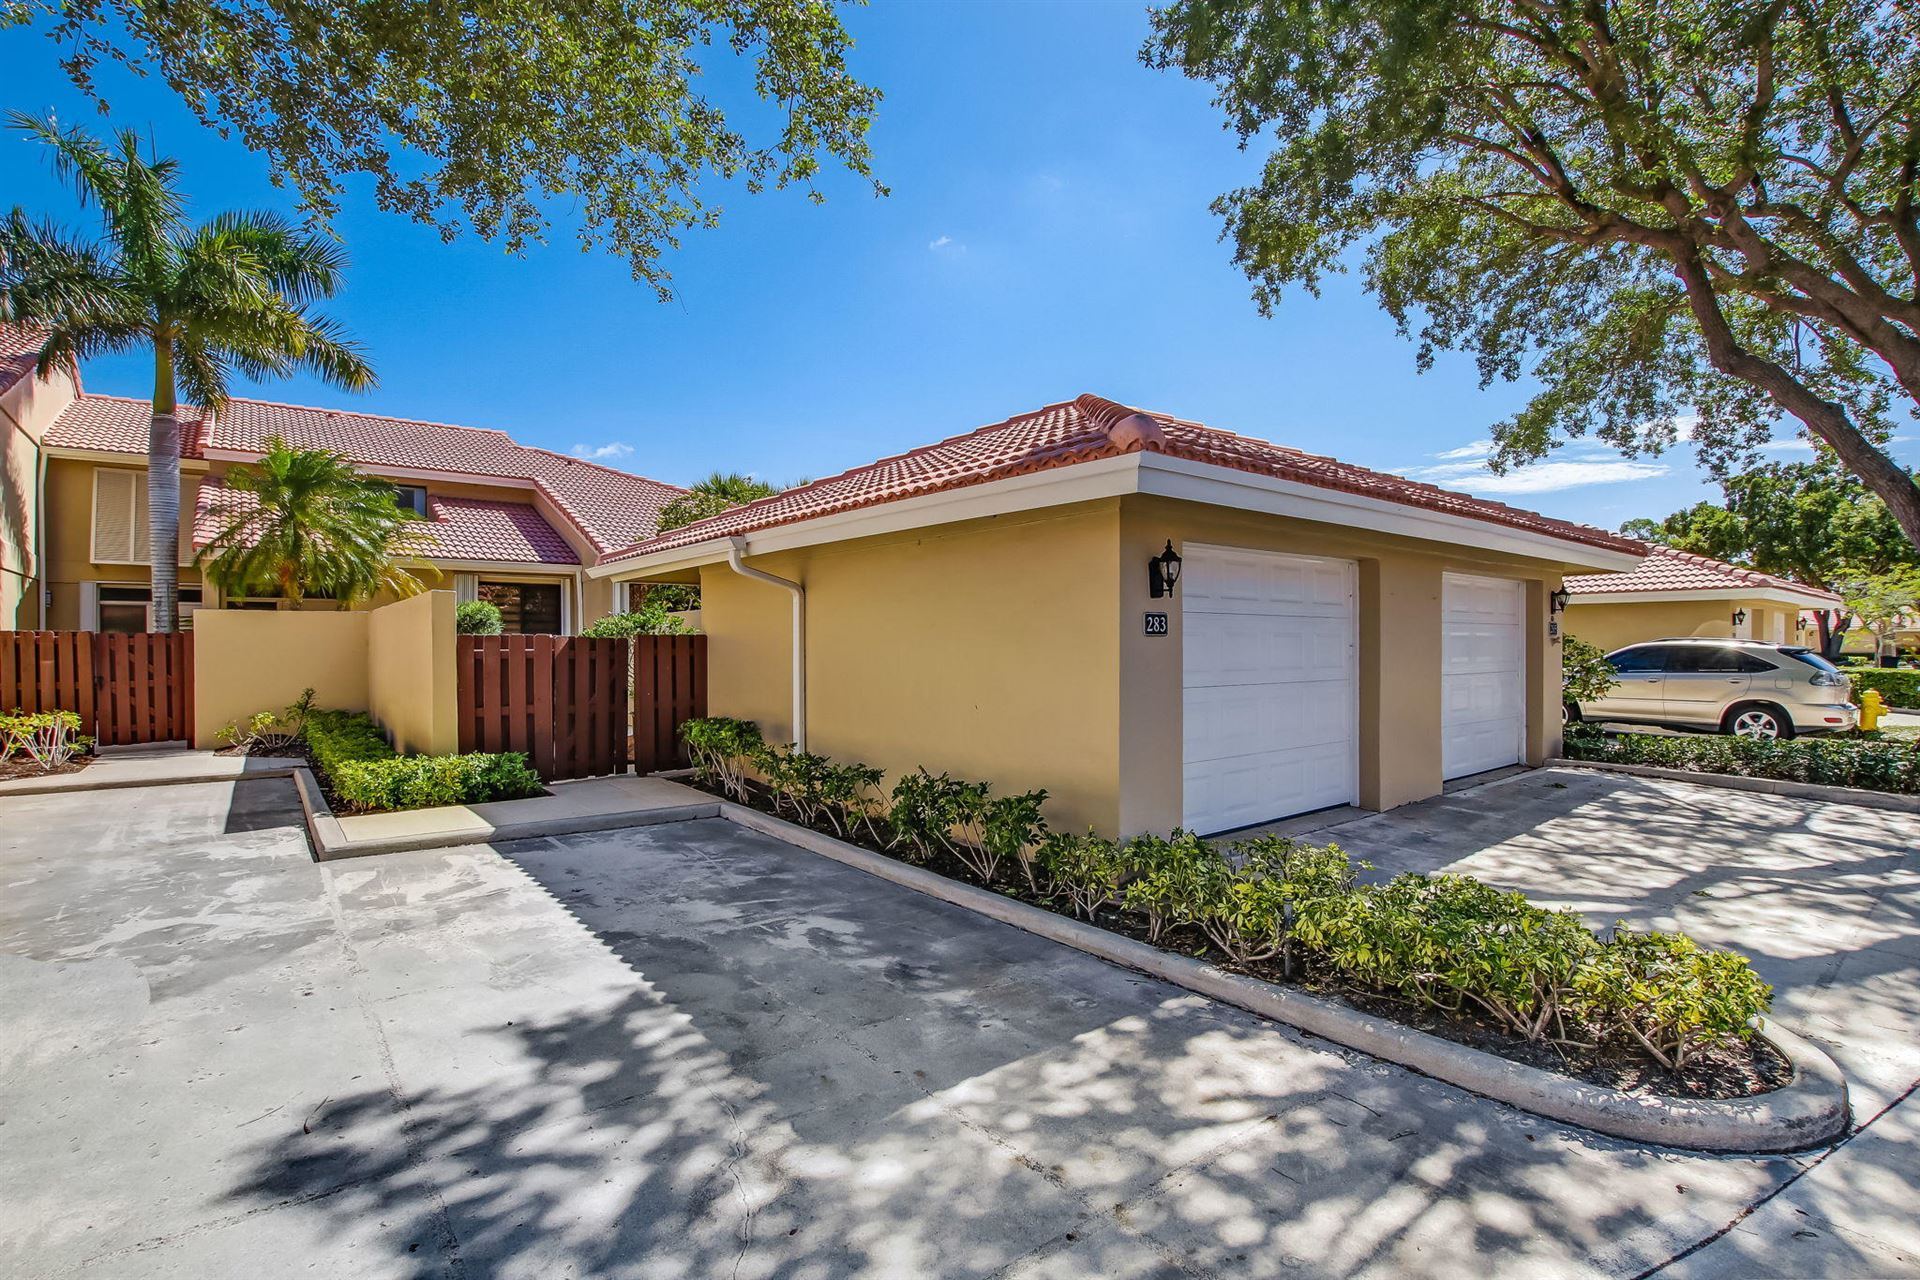 283 Old Meadow Way #283, Palm Beach Gardens, FL 33418 - MLS#: RX-10722837